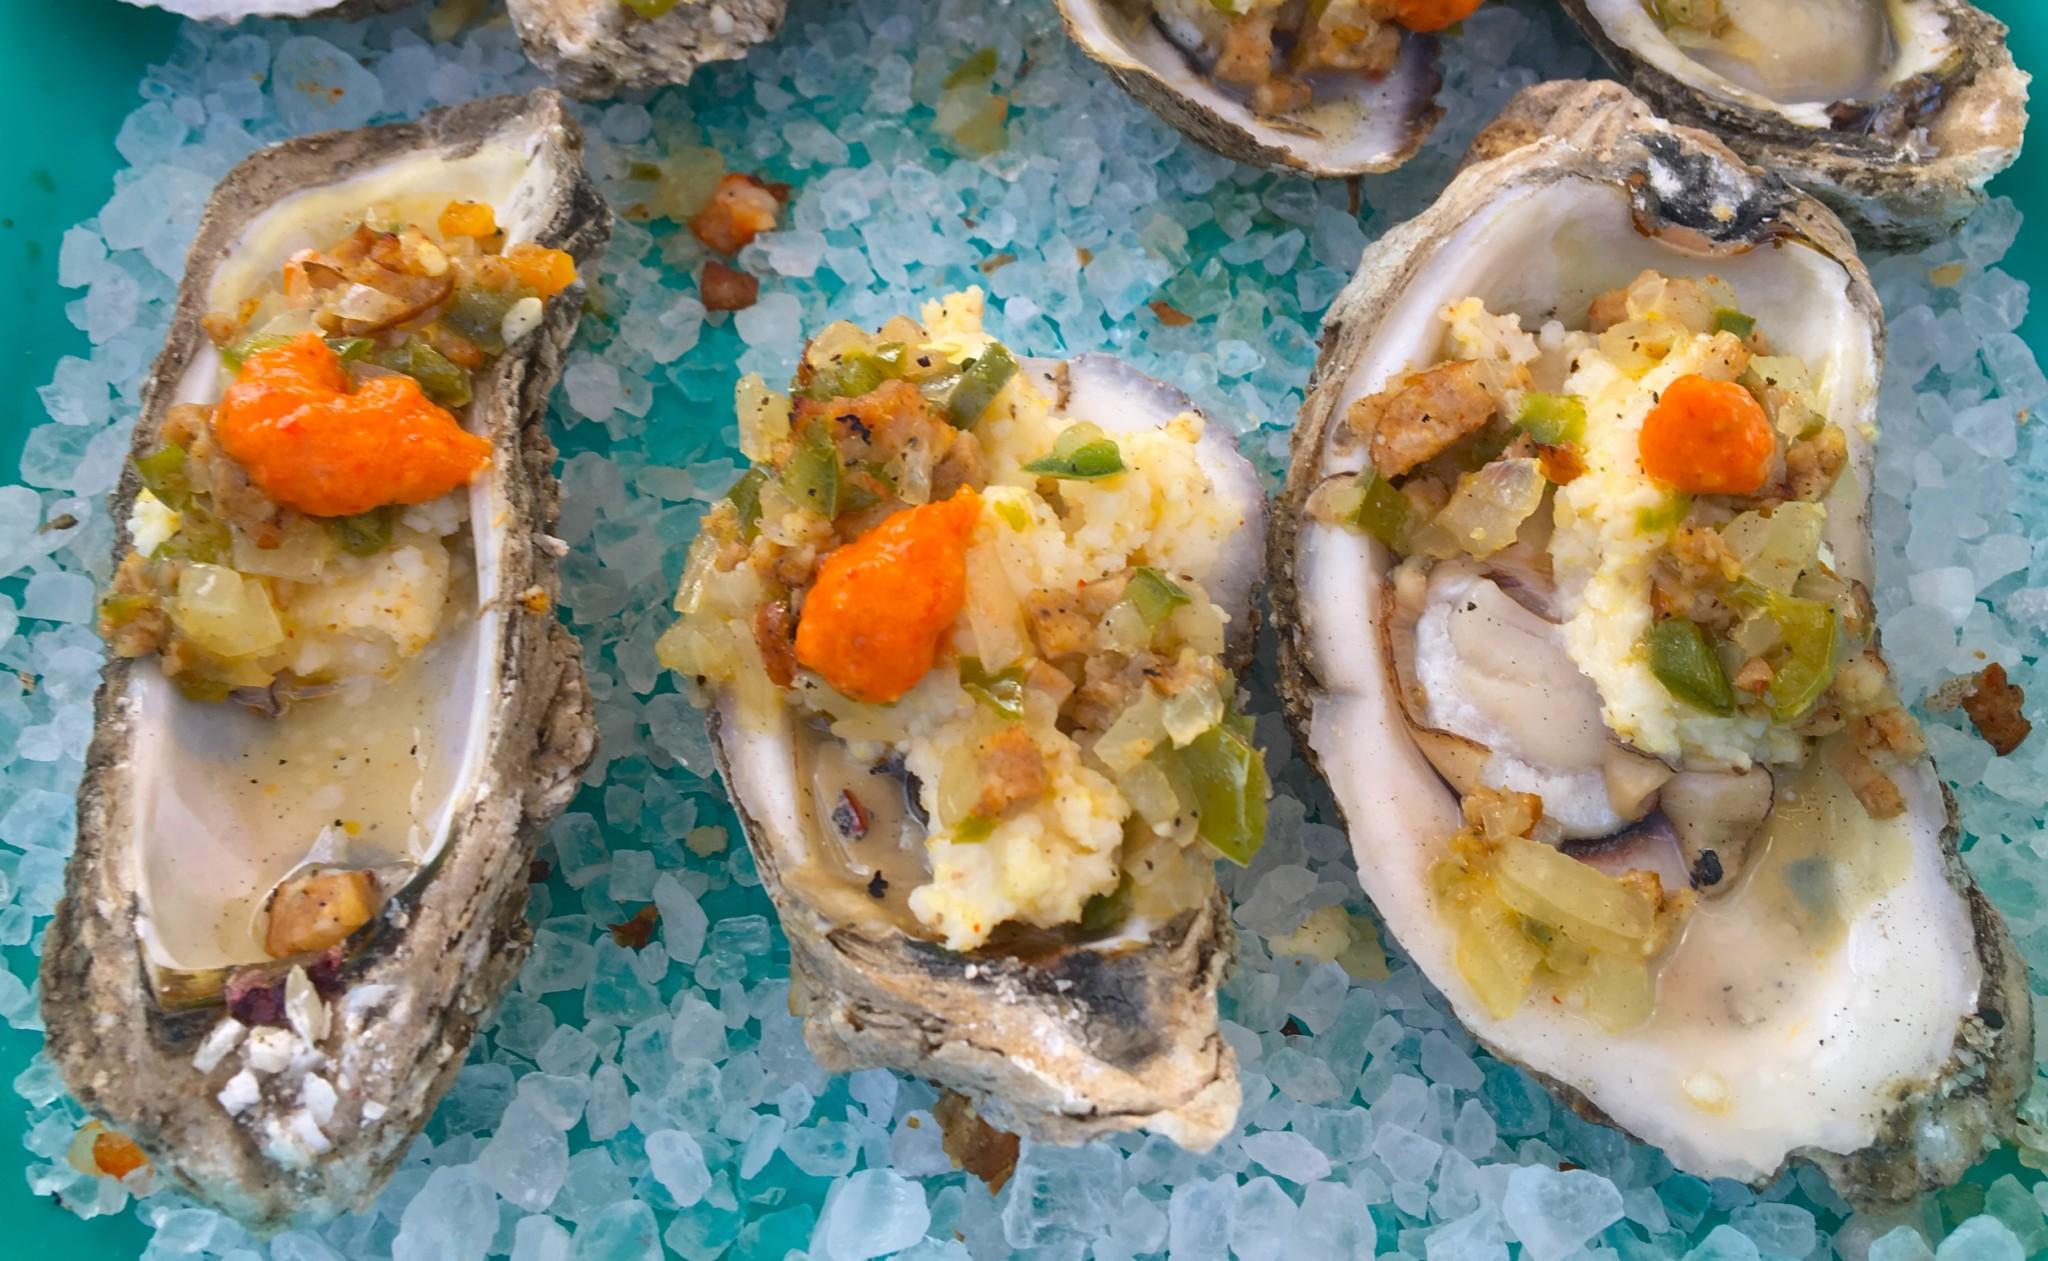 Beach House Kitchen (Gulf Shores, AL) won the Cajun category.